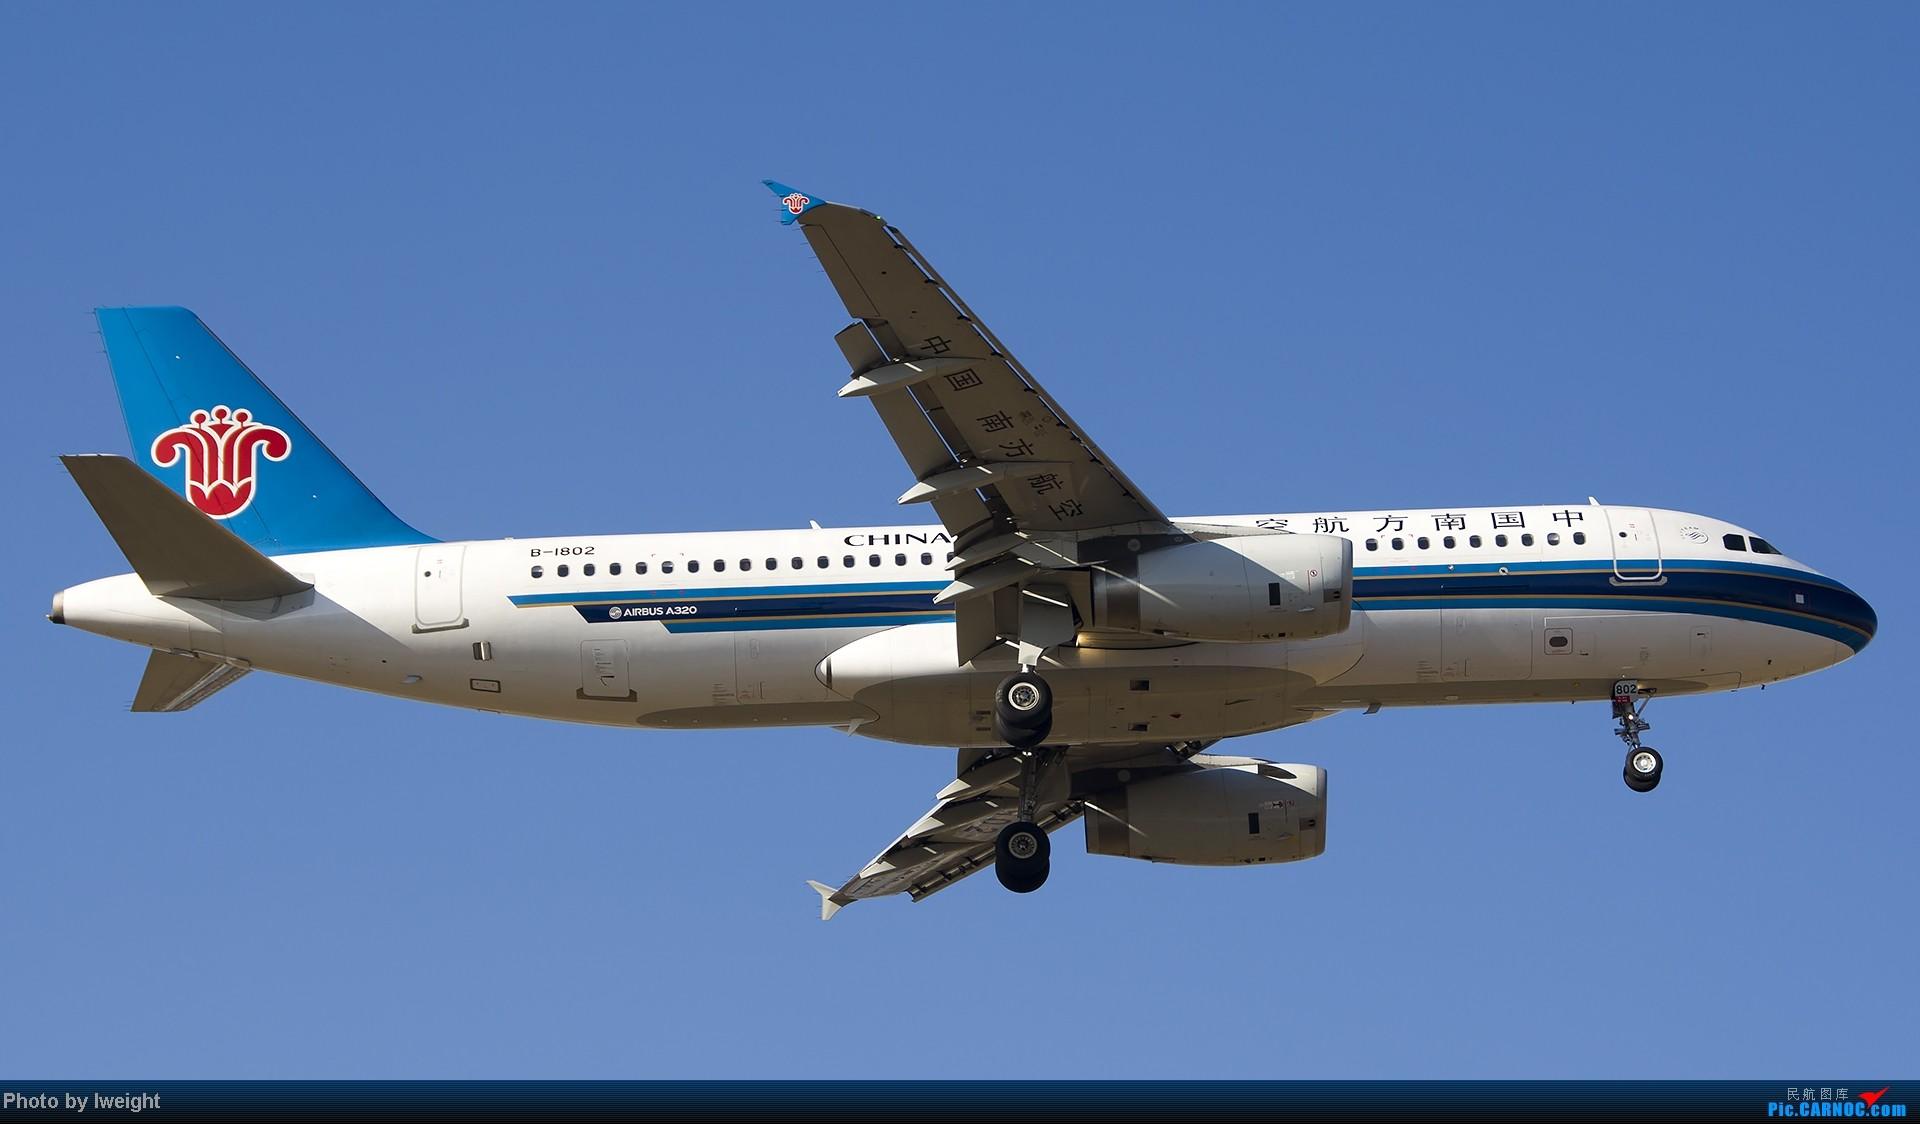 Re:[原创]抓住APEC蓝的尾巴,再拍上一组 AIRBUS A320-200 B-1802 中国北京首都机场